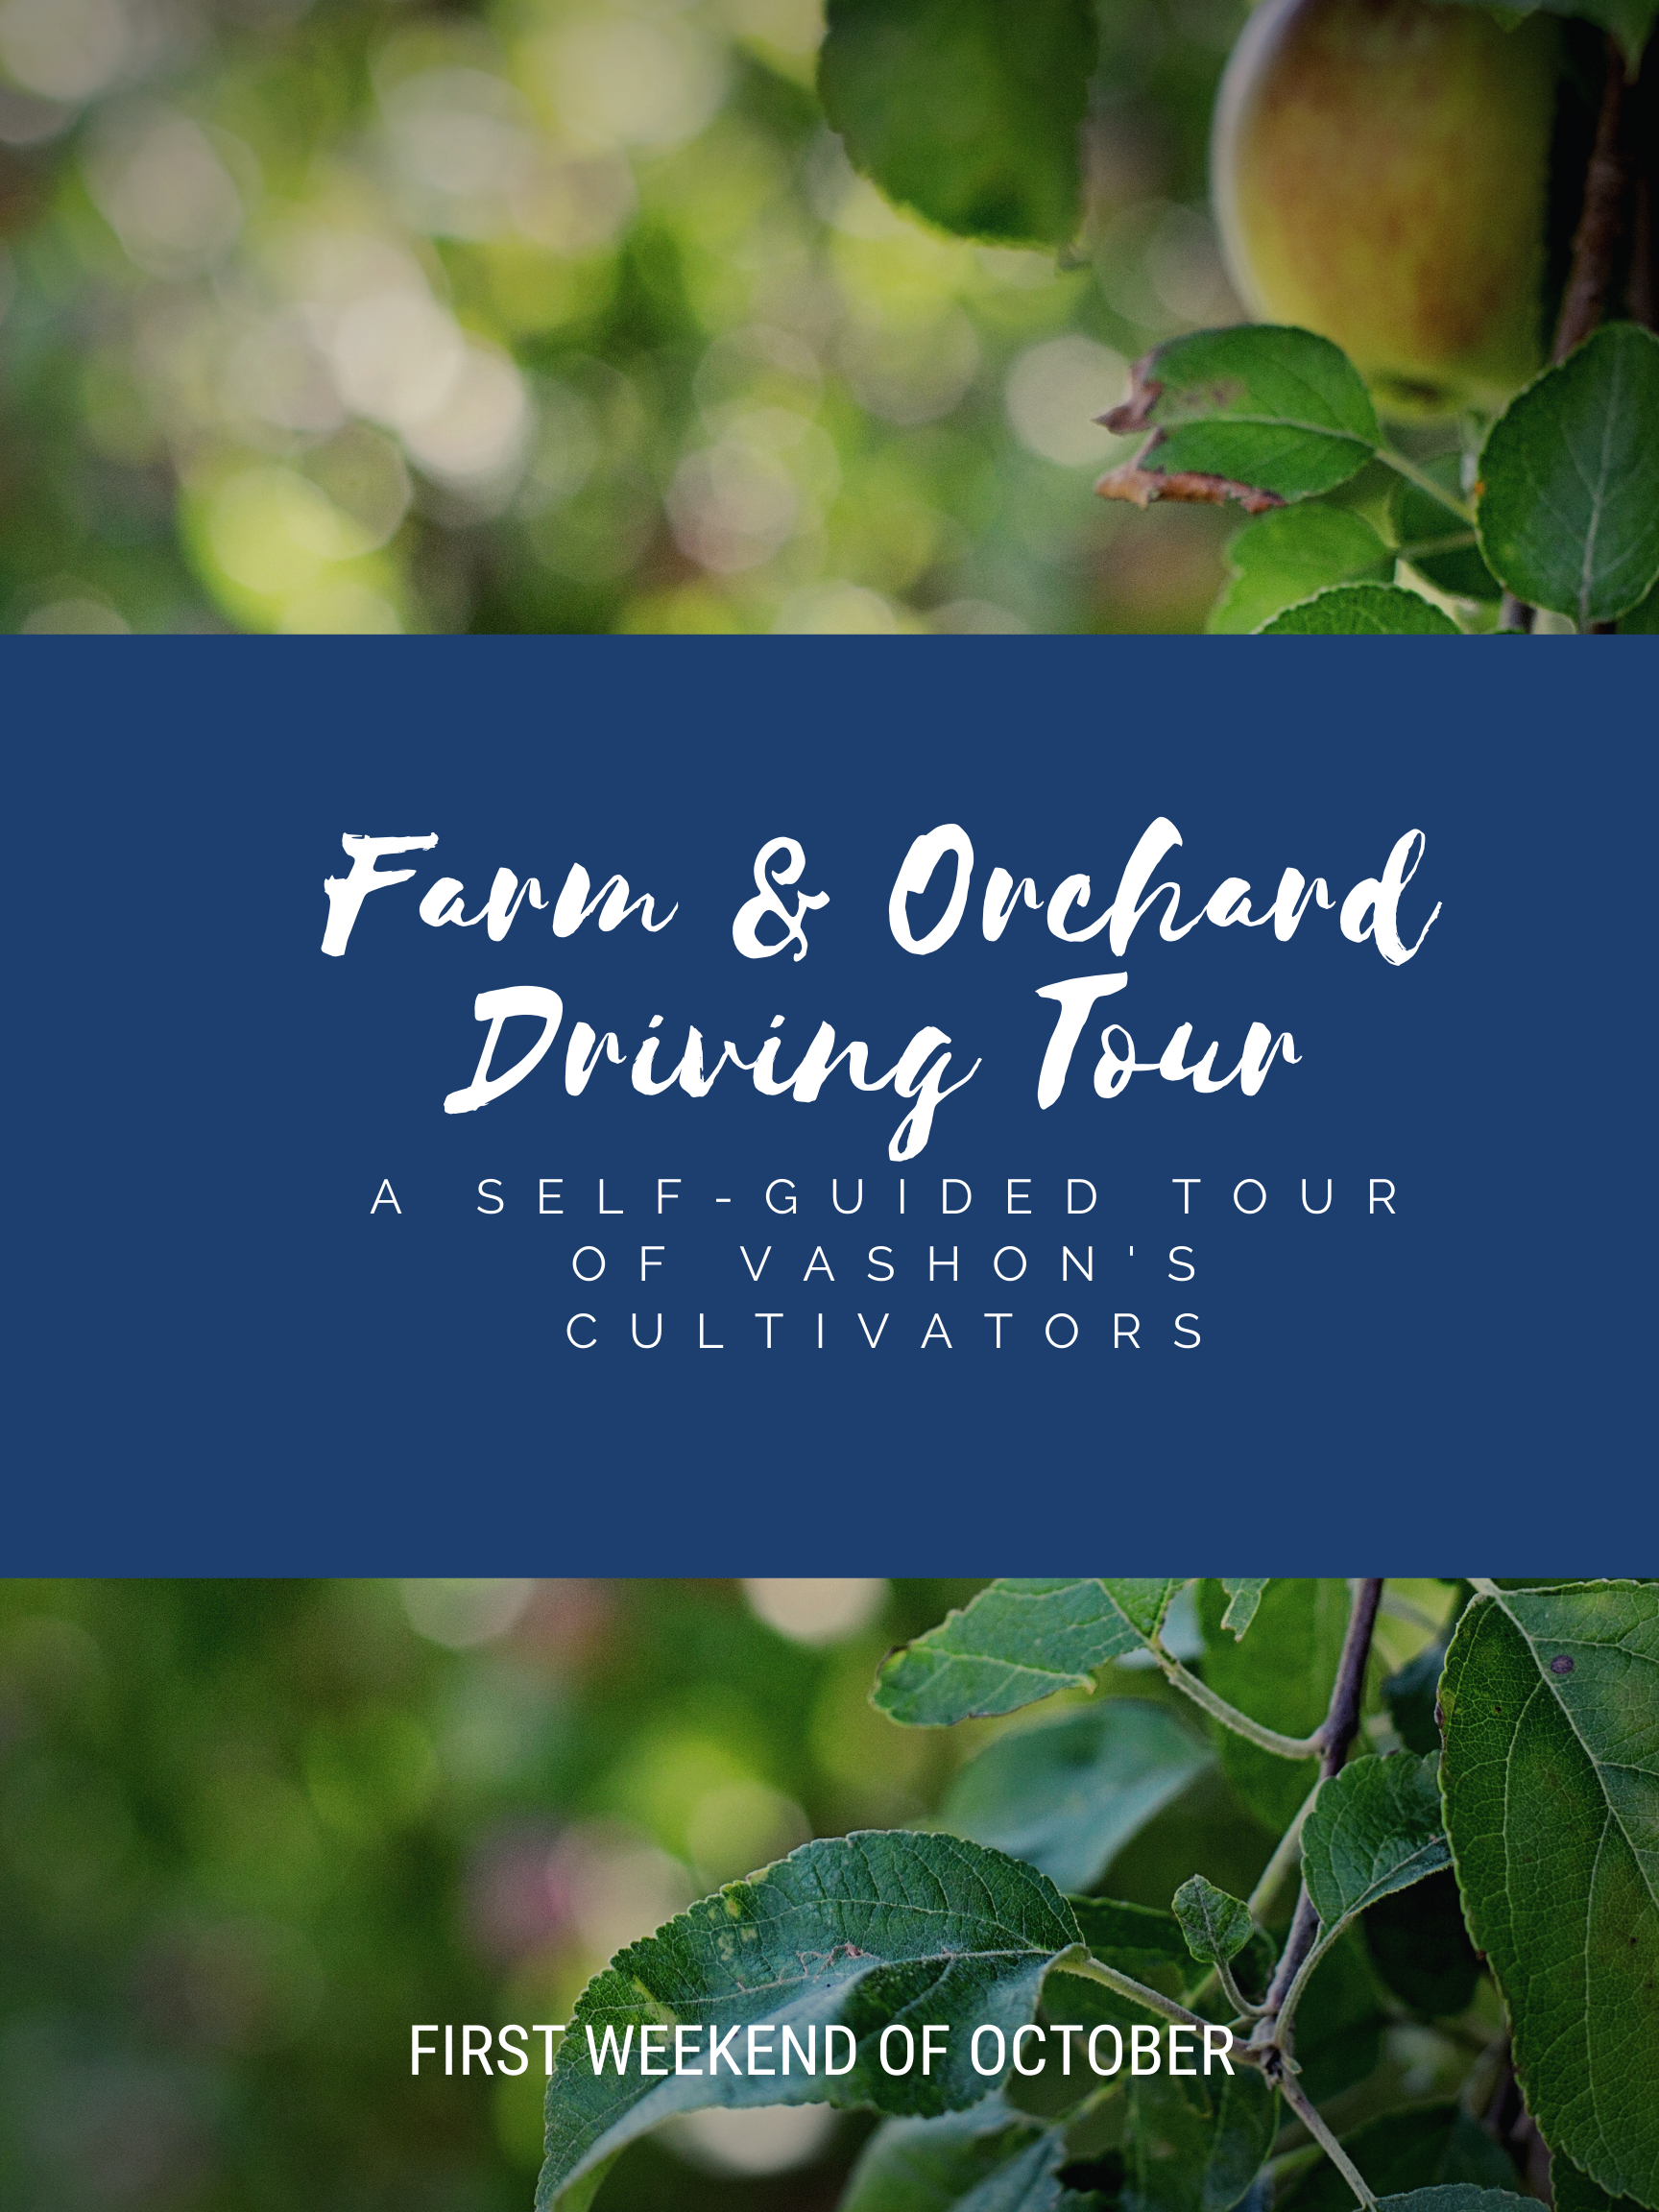 Farm & Orchard Driving Tour (1)